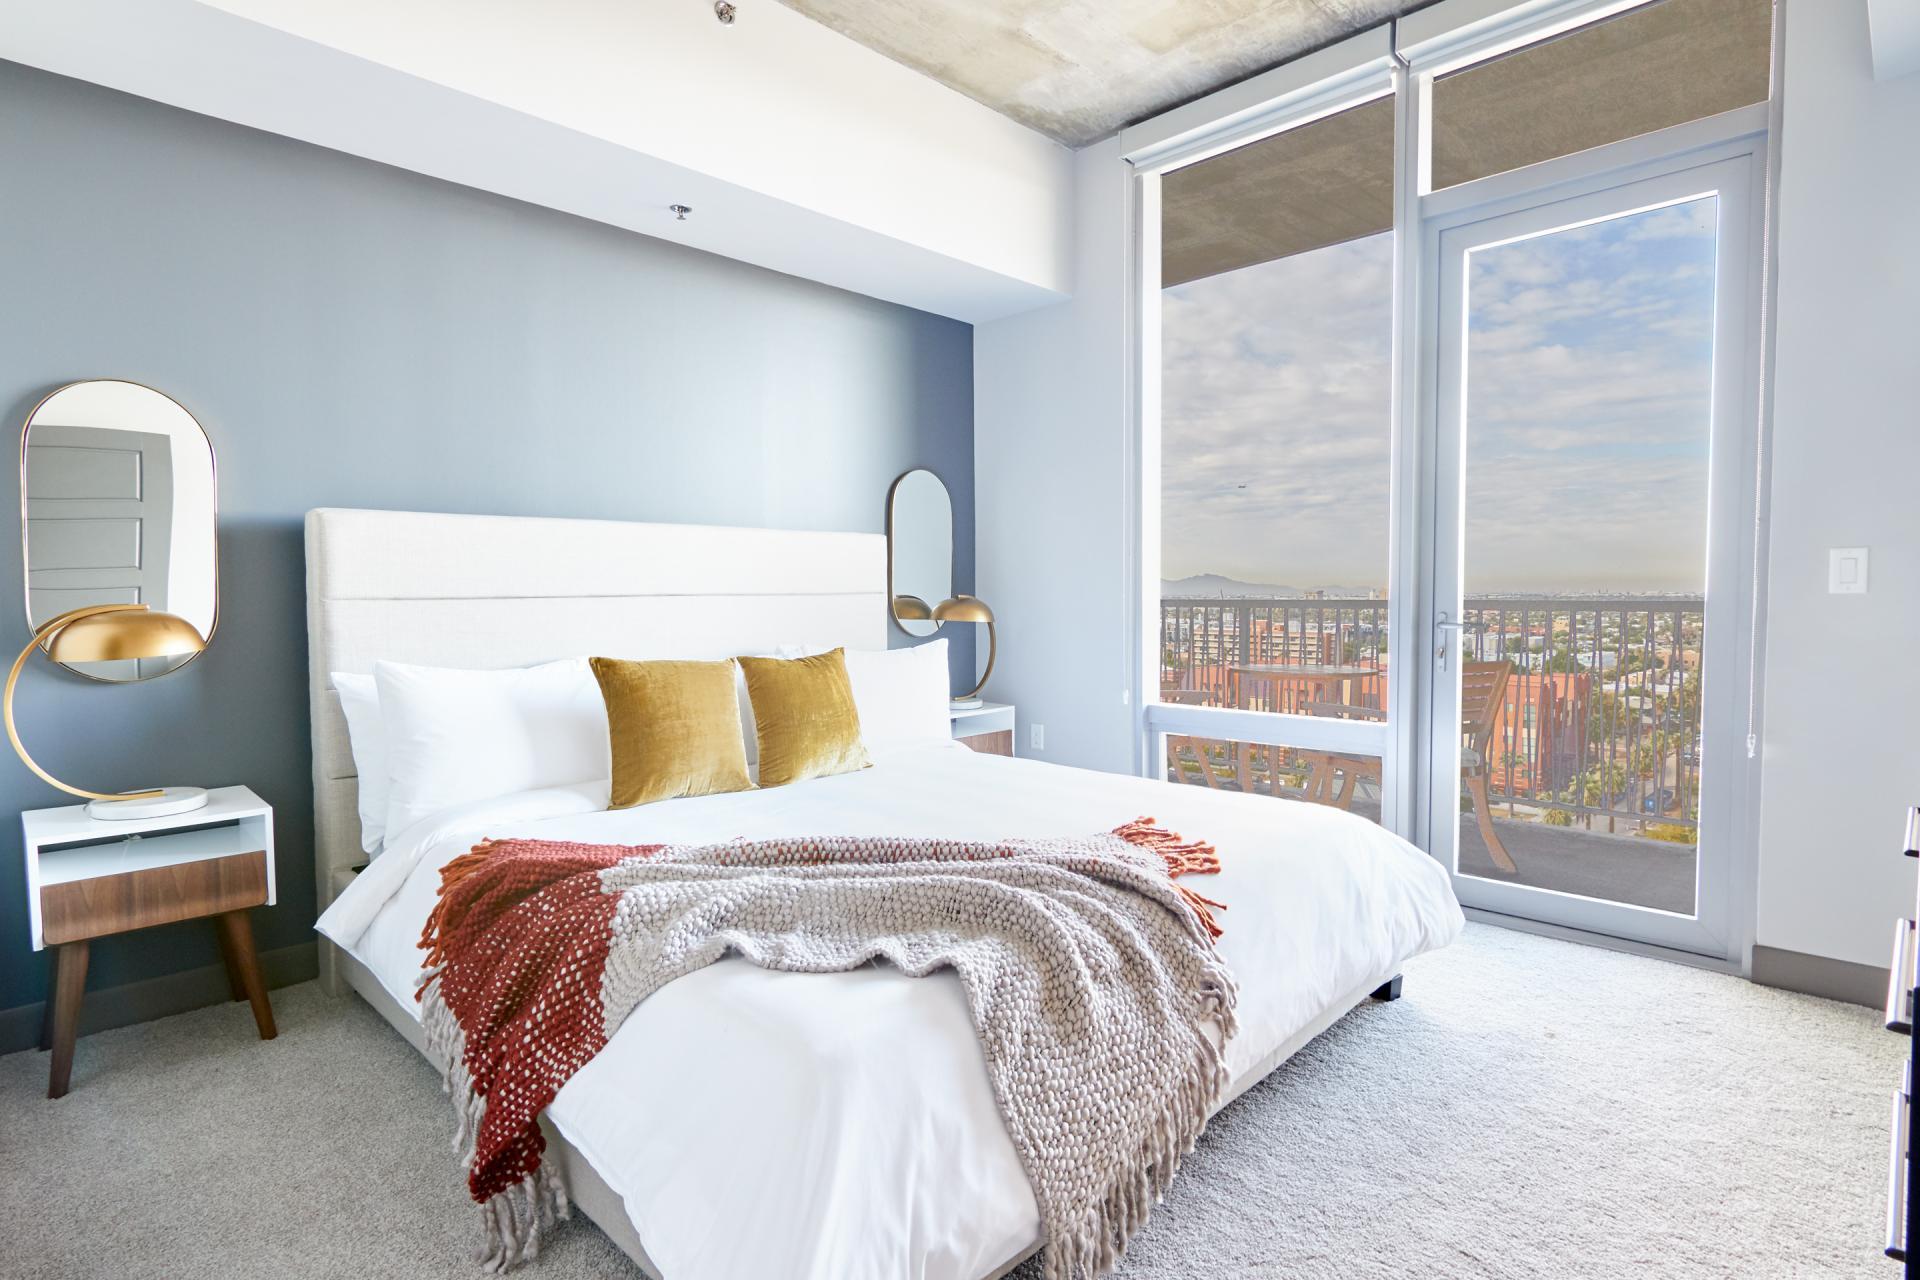 Bedroom at McKinley Apartments, Center, Phoenix